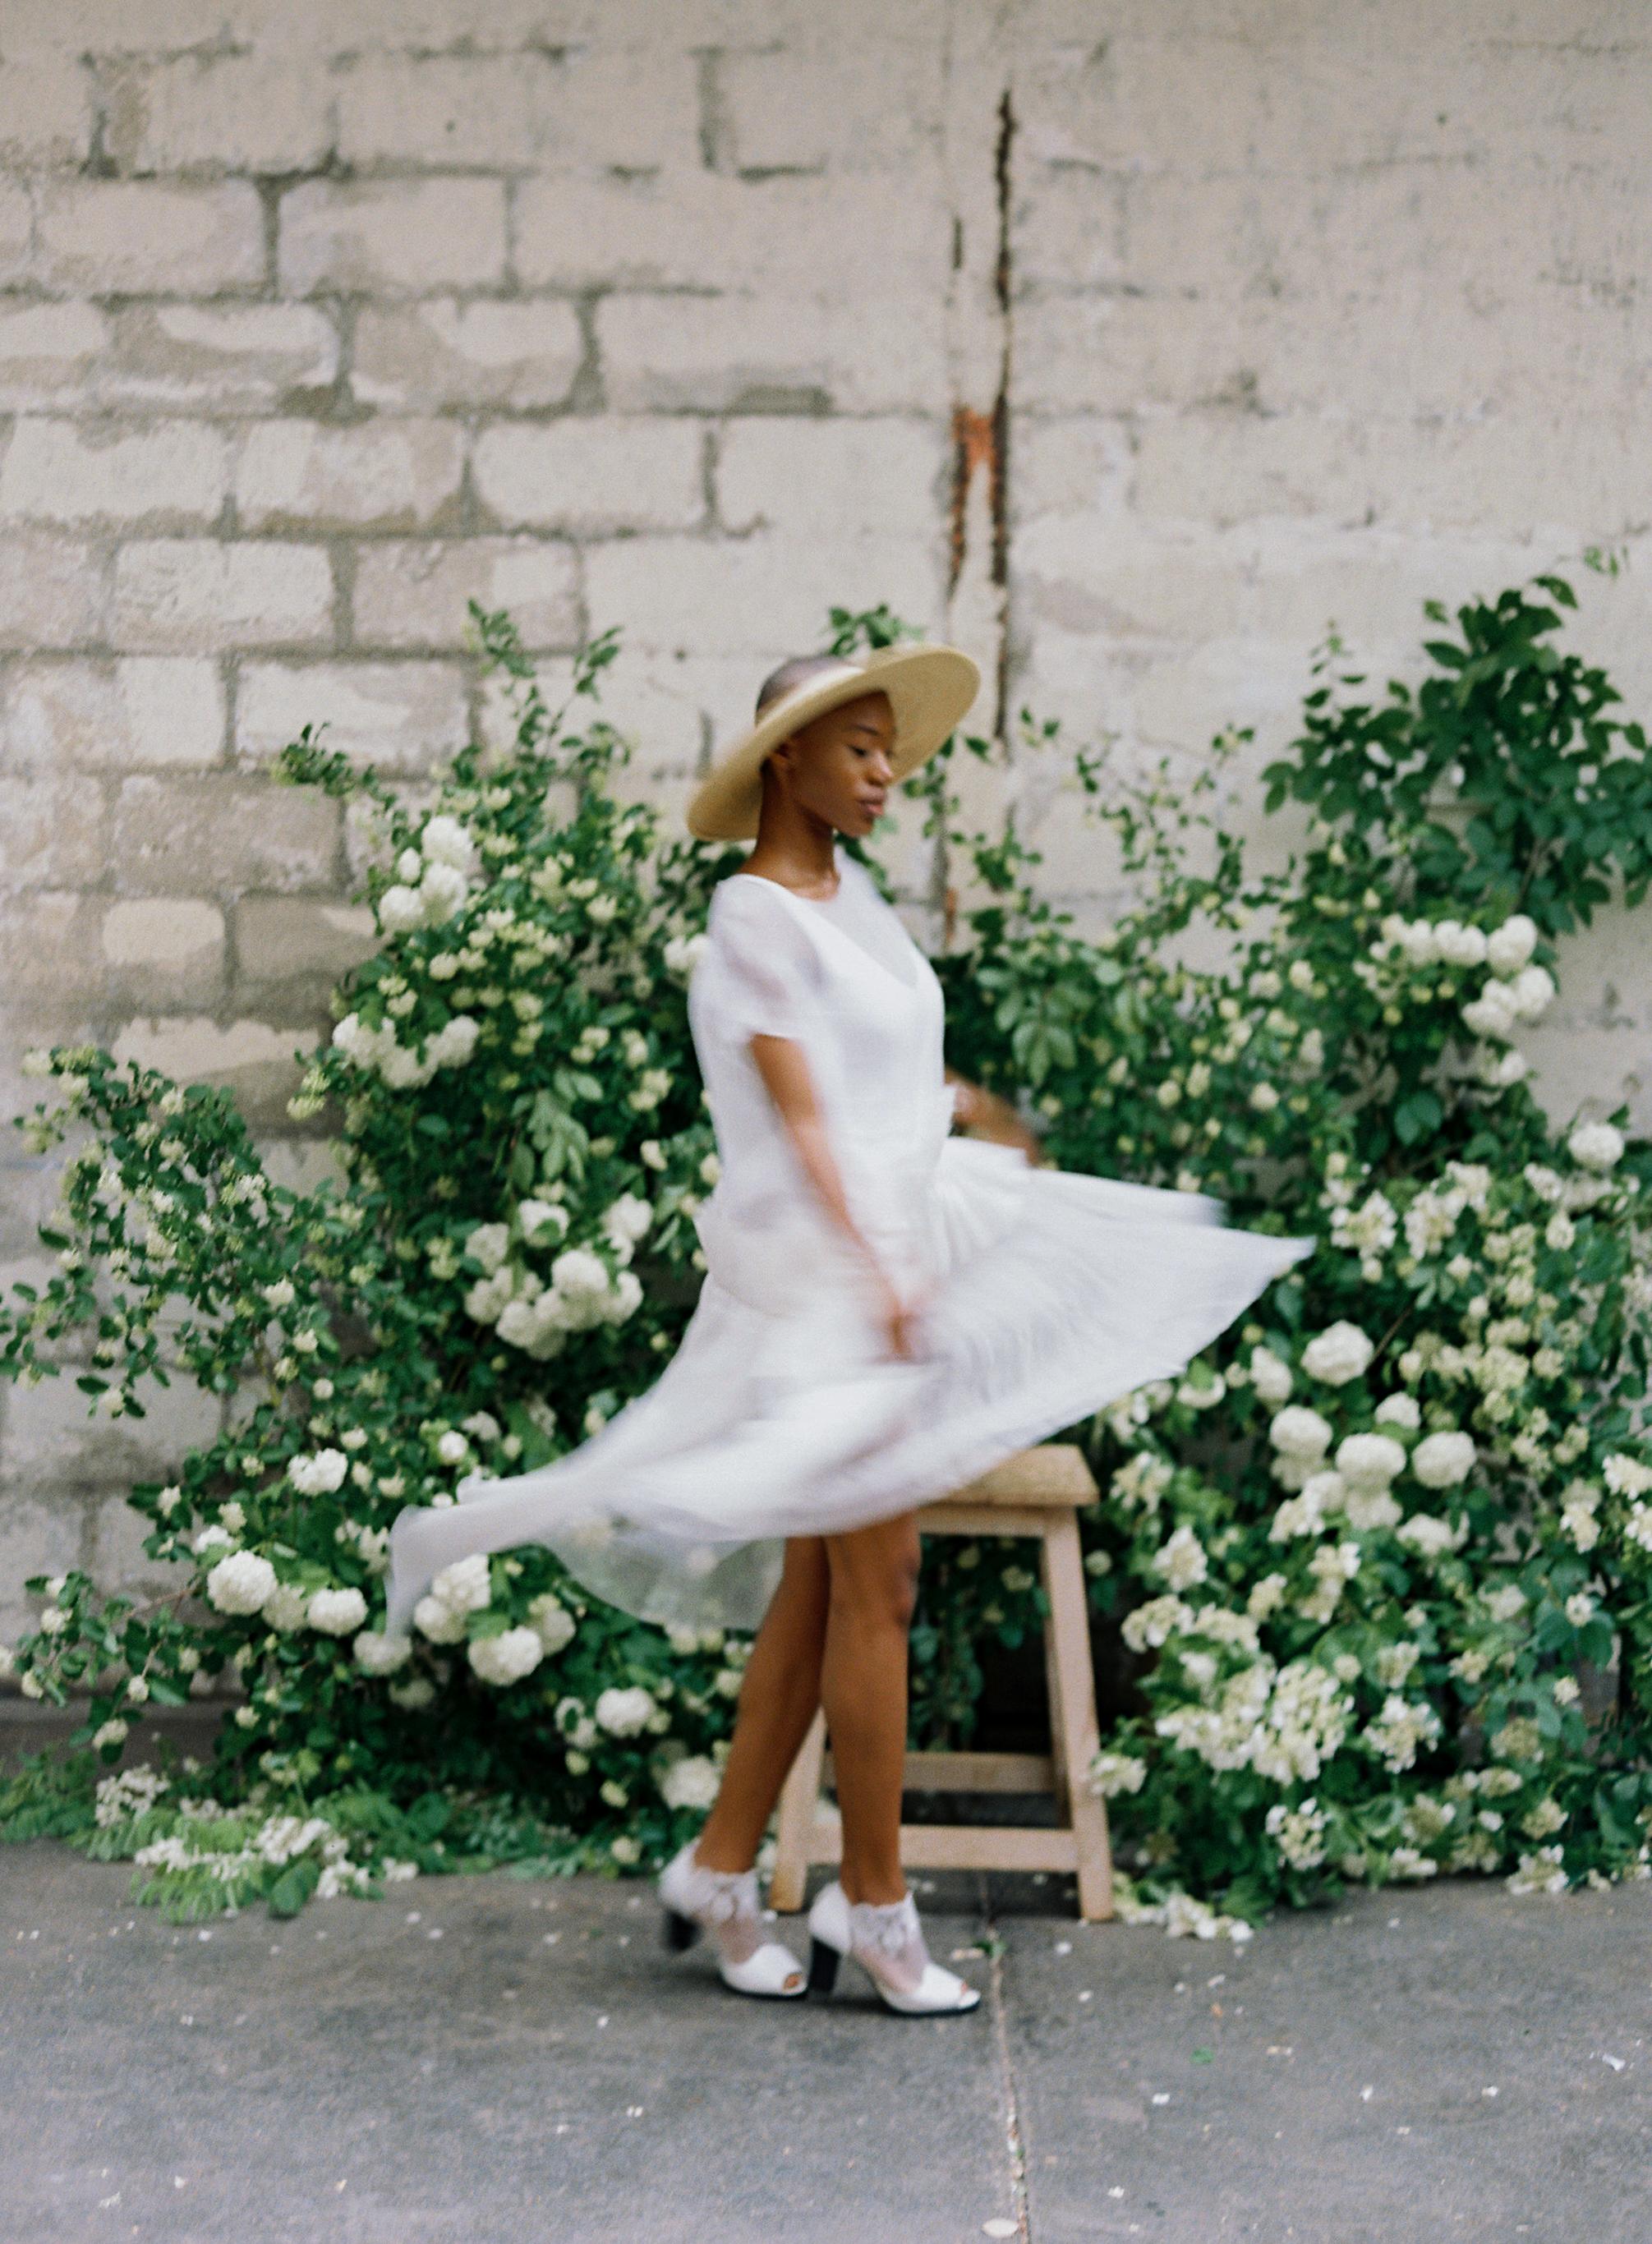 Floresie-Carrie King photographer-8.jpg